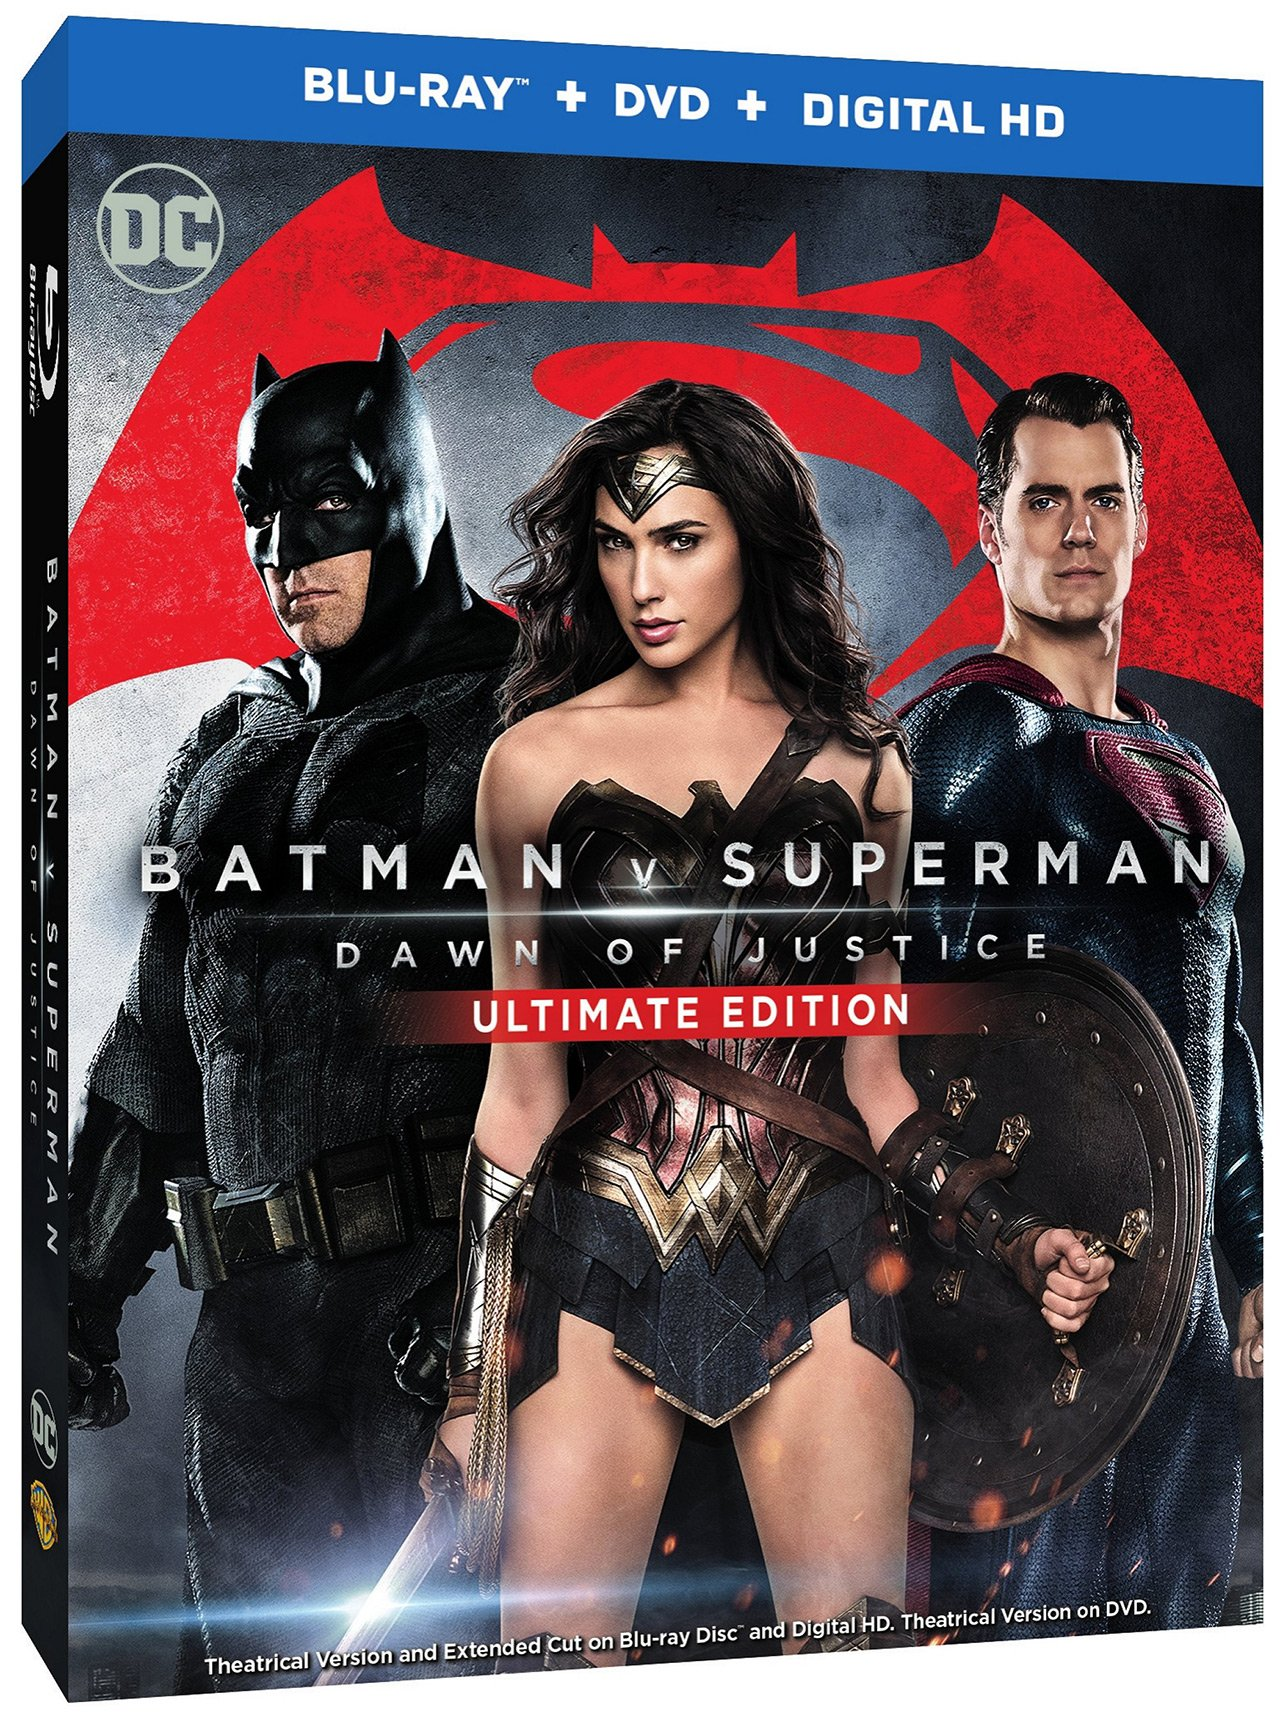 Batman v Superman Blu-ray Dolby Atmos